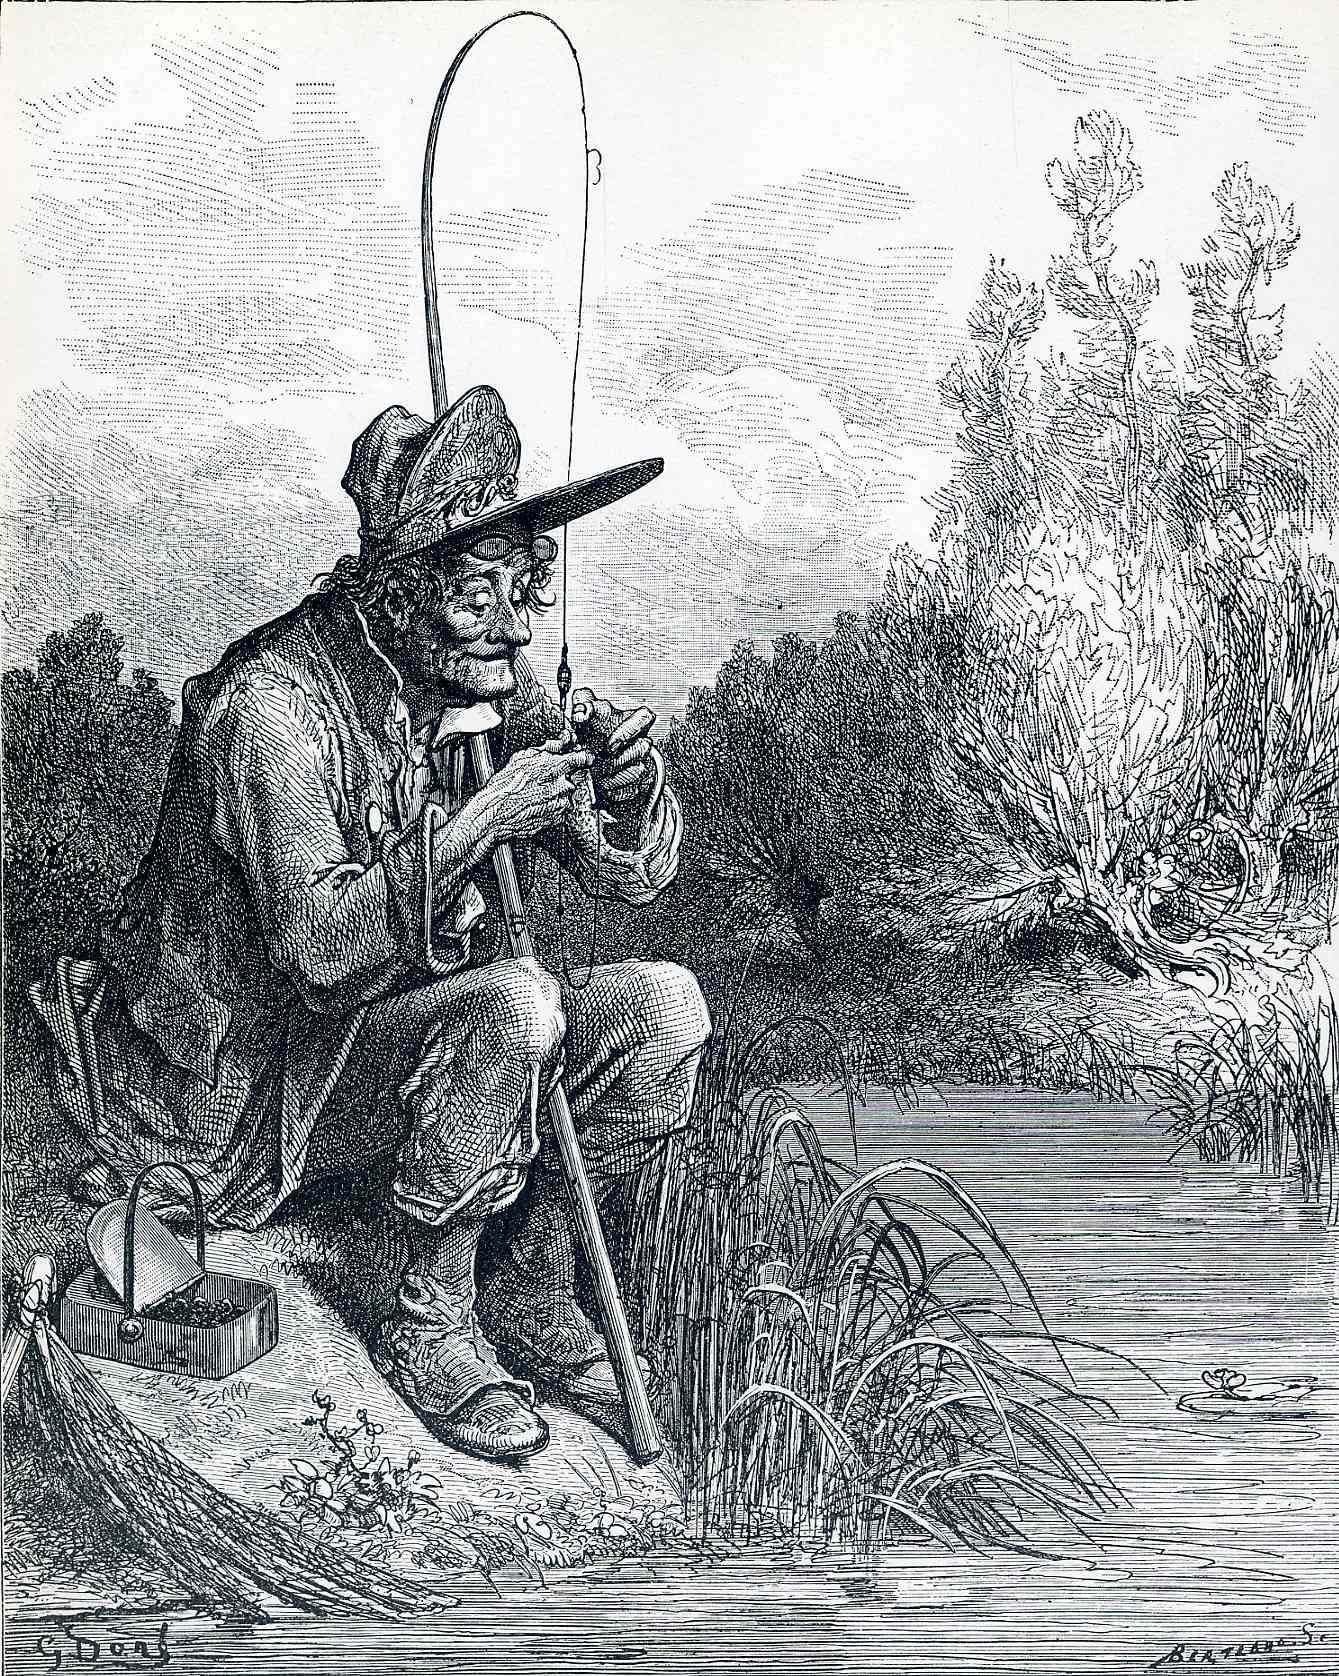 Картины, гравюры - Гюстав Доре / Pictures ...: nevsepic.com.ua/art-i-risovanaya-grafika/page,27,18664-kartiny...